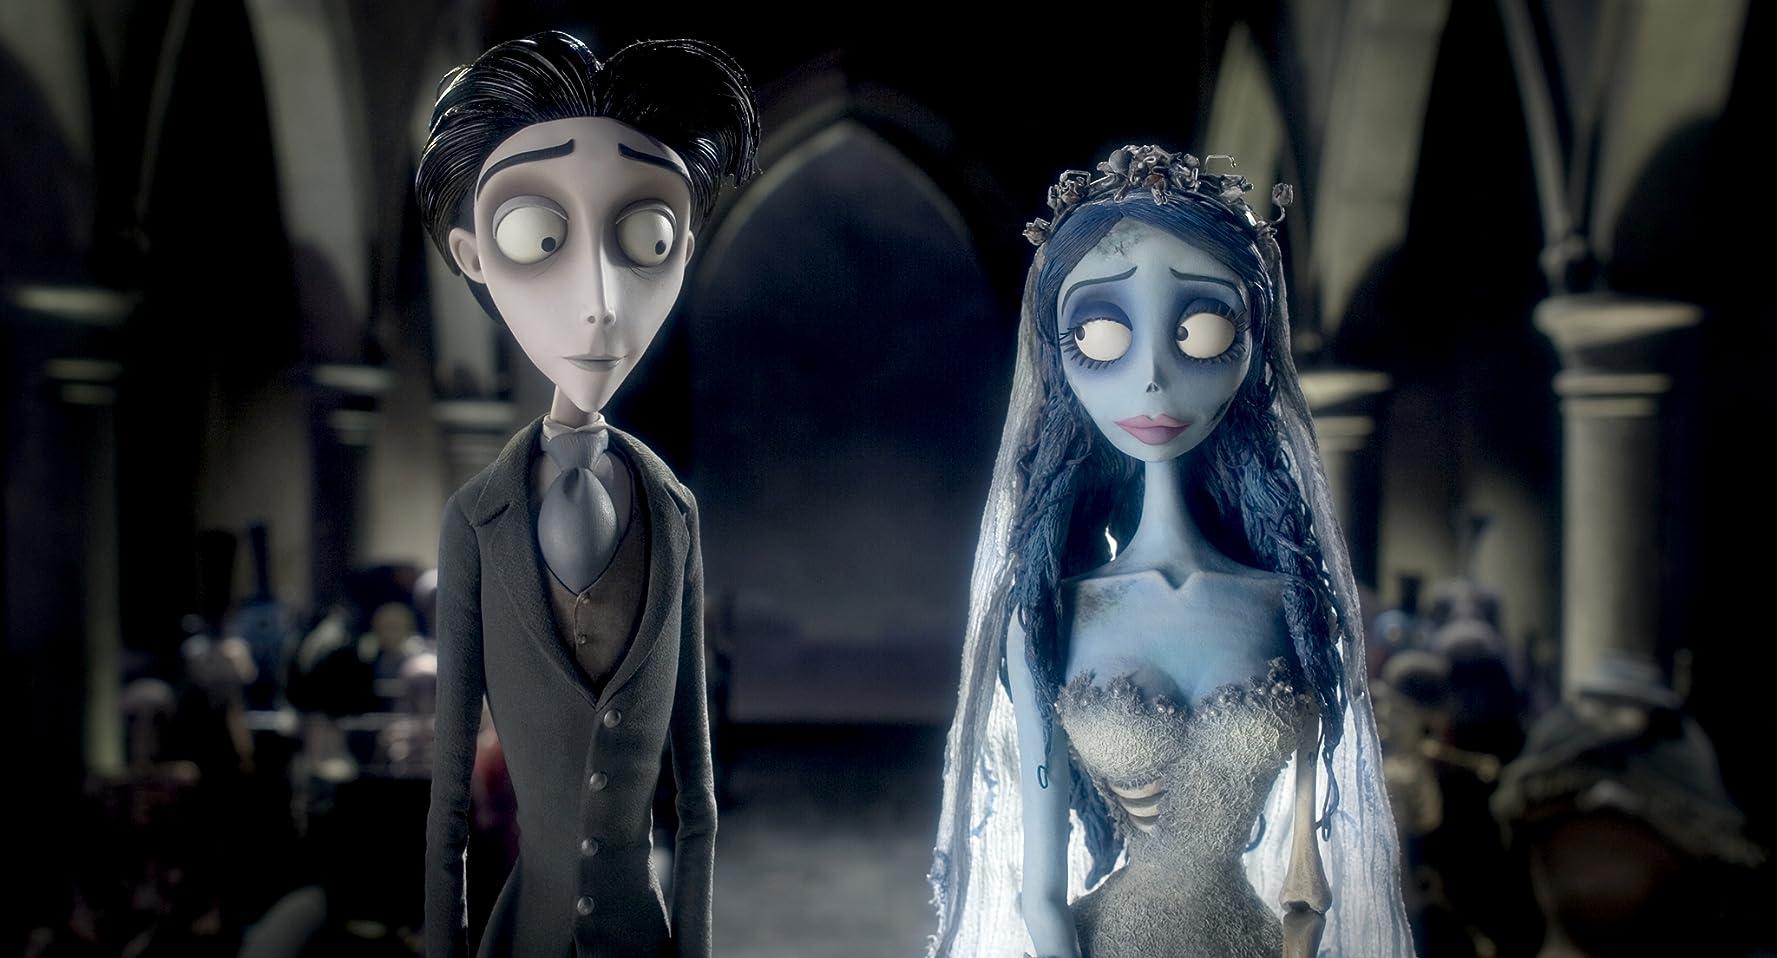 Johnny Depp and Helena Bonham Carter in Corpse Bride (2005)